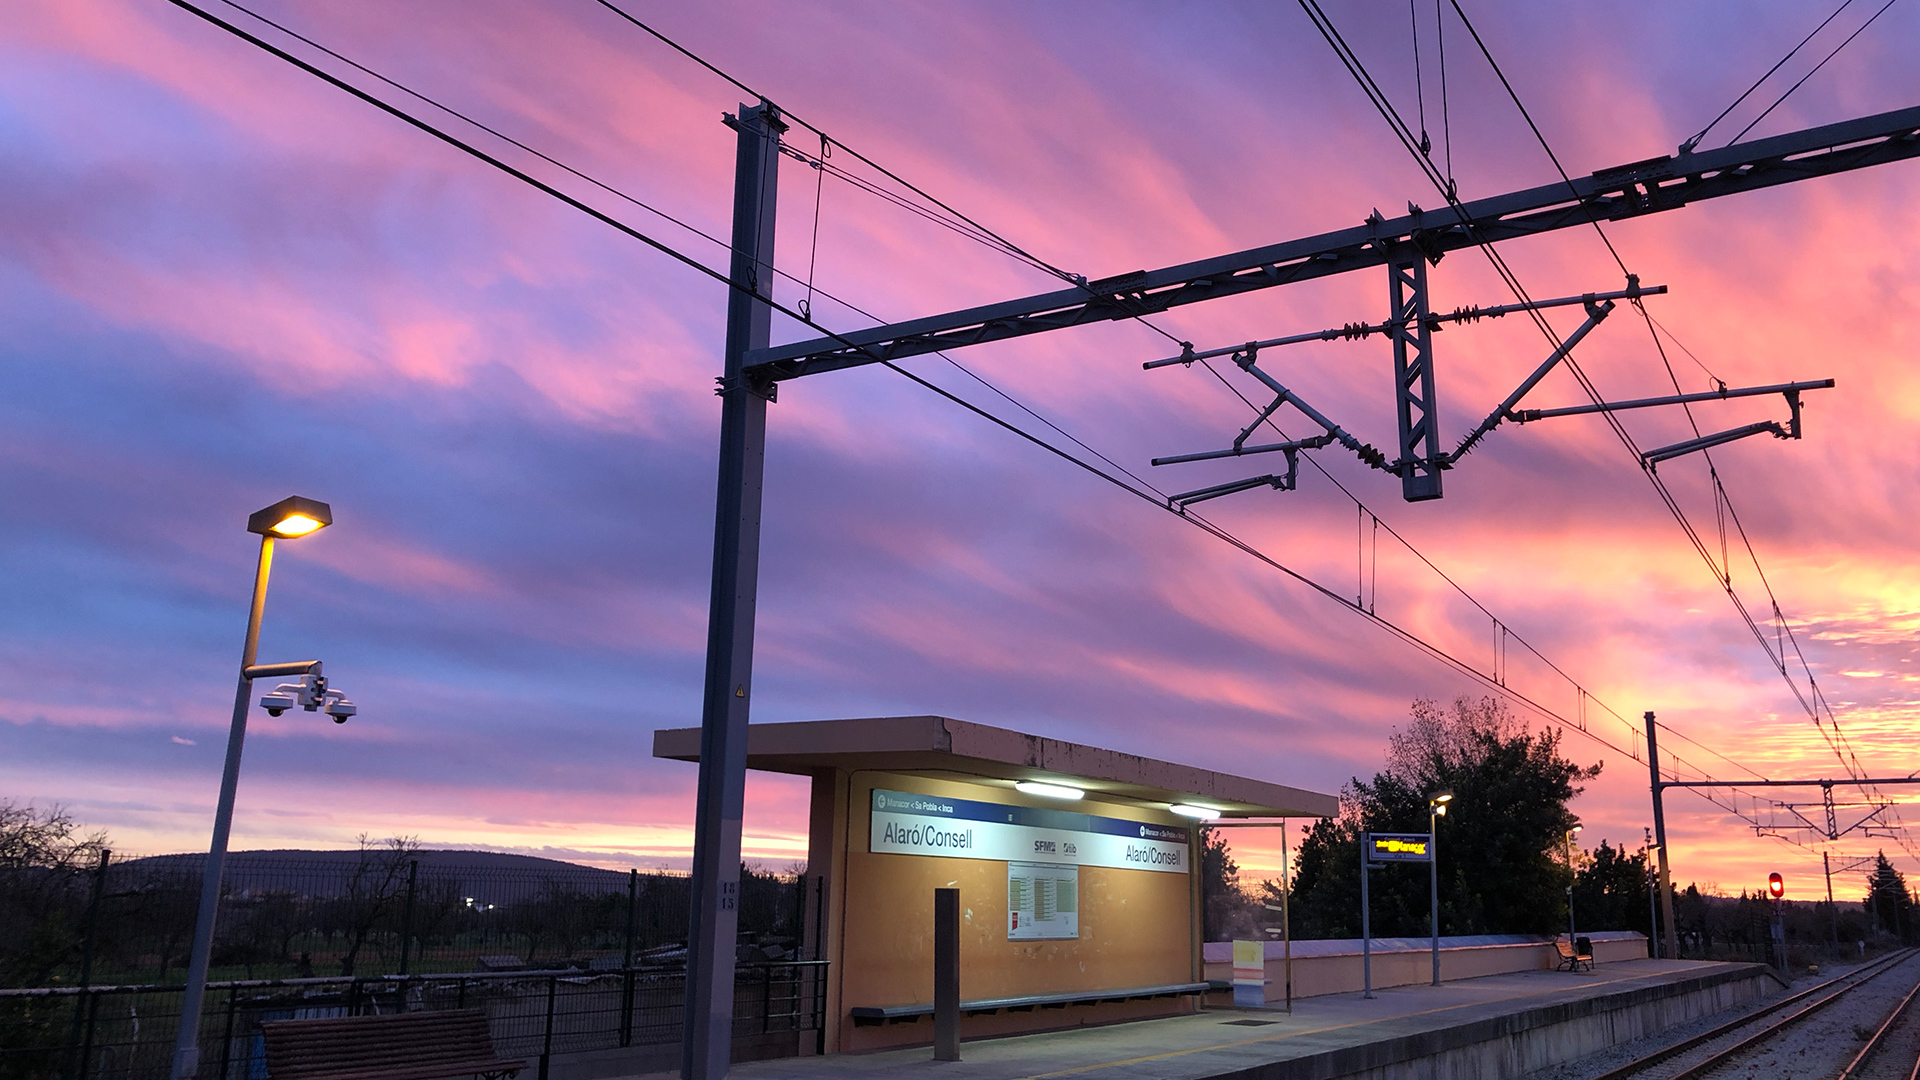 Susnet autumn train station Photo Adele Chretien